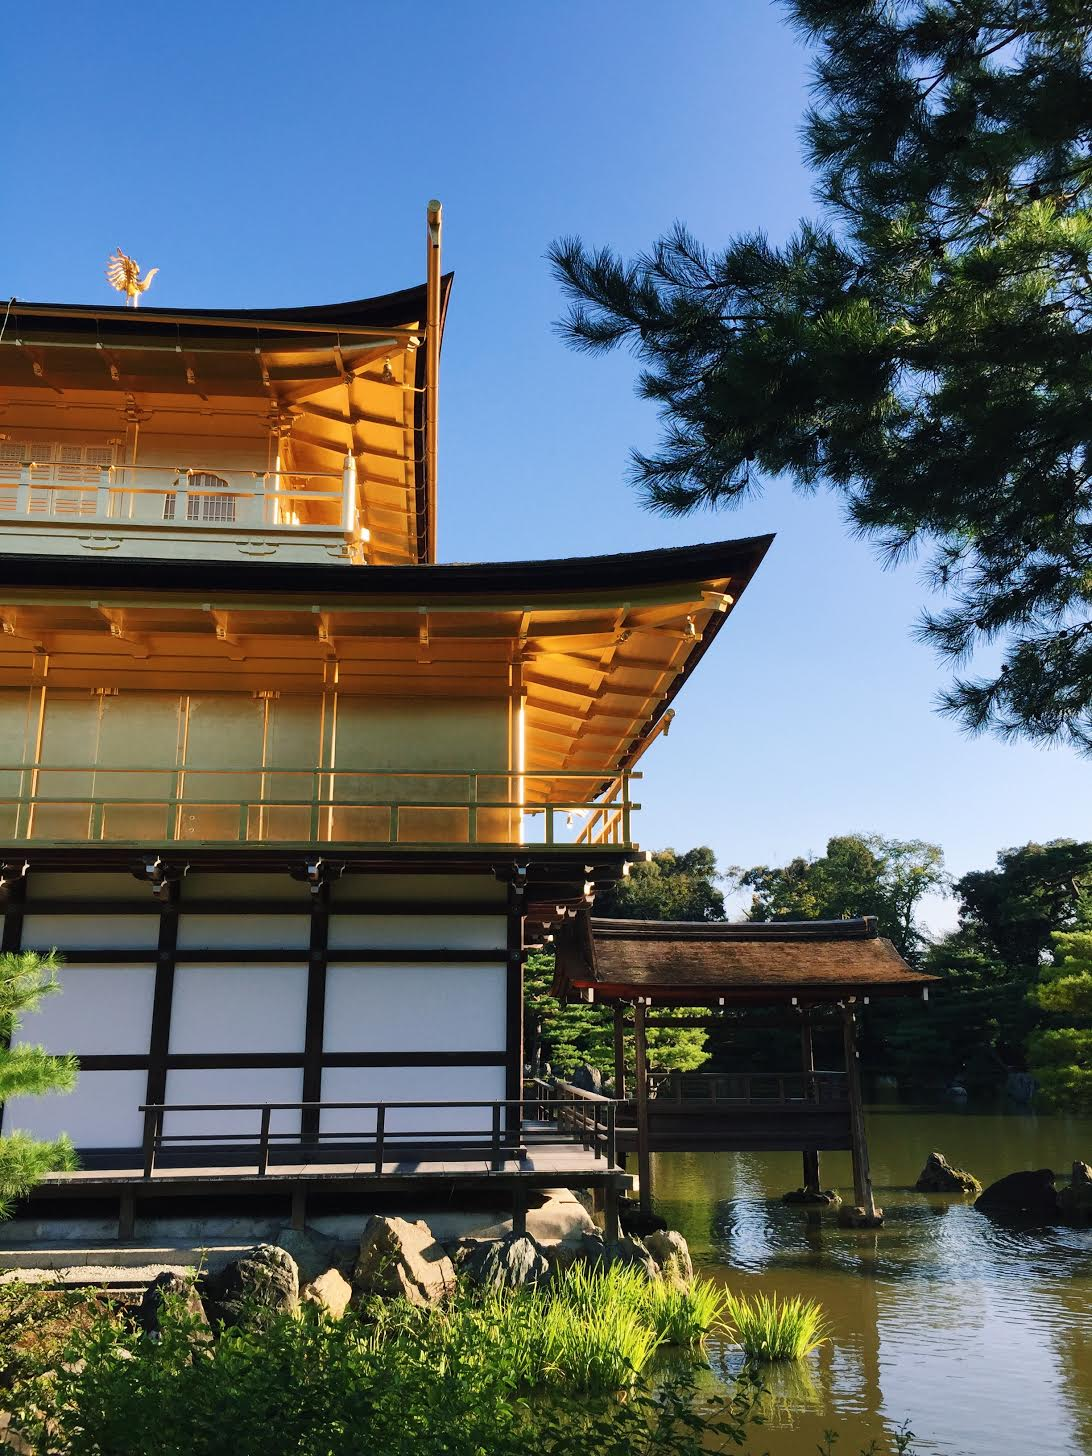 Muslim-travel-recommendations-Kinkaku-ji-Kyoto.jpg